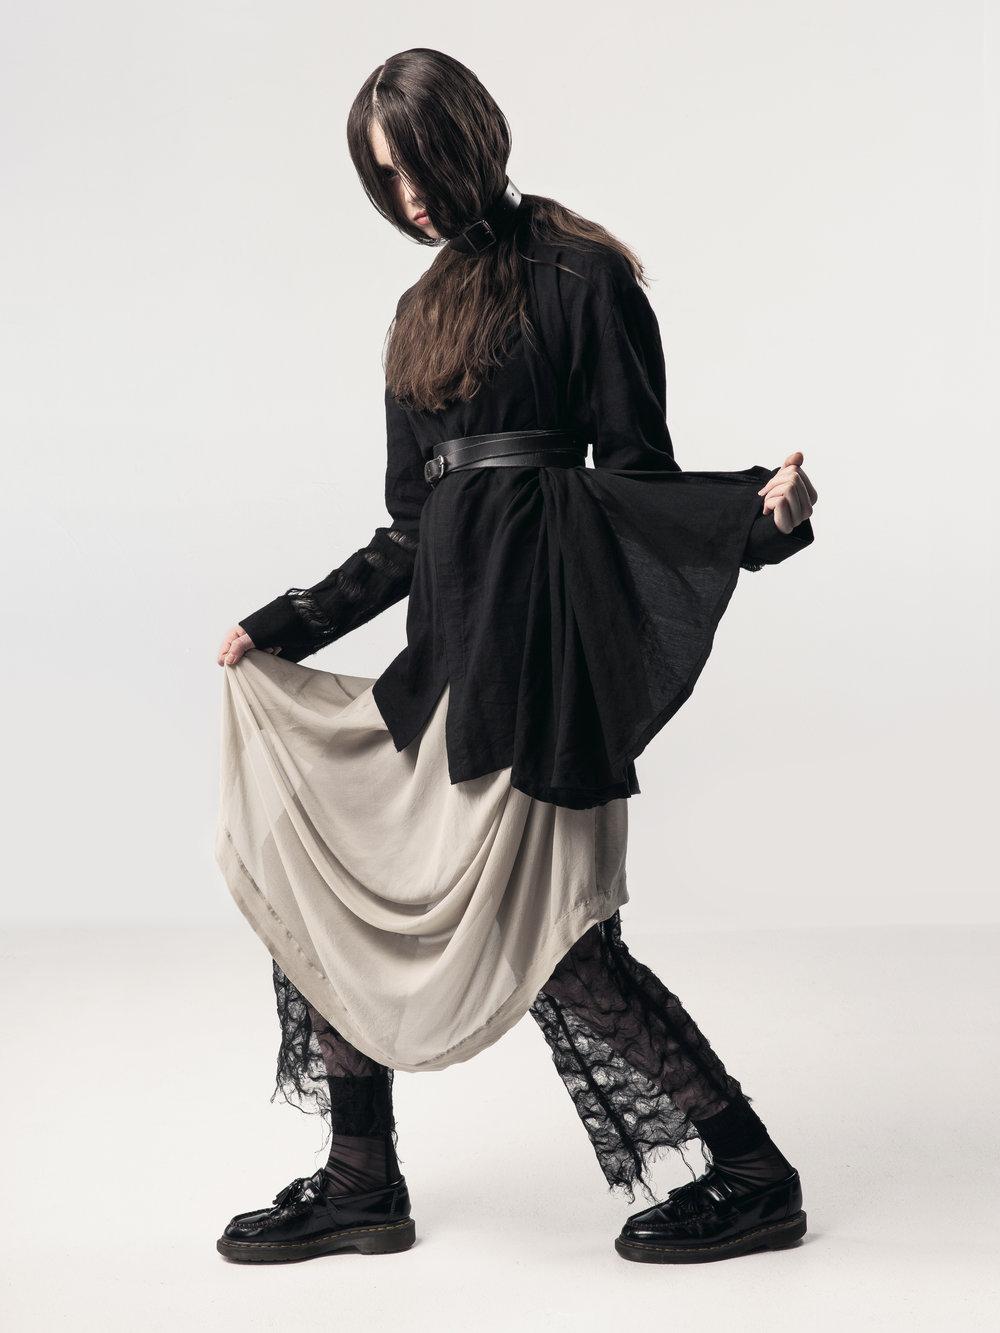 03-Black-Thian-Fieulaine.jpg